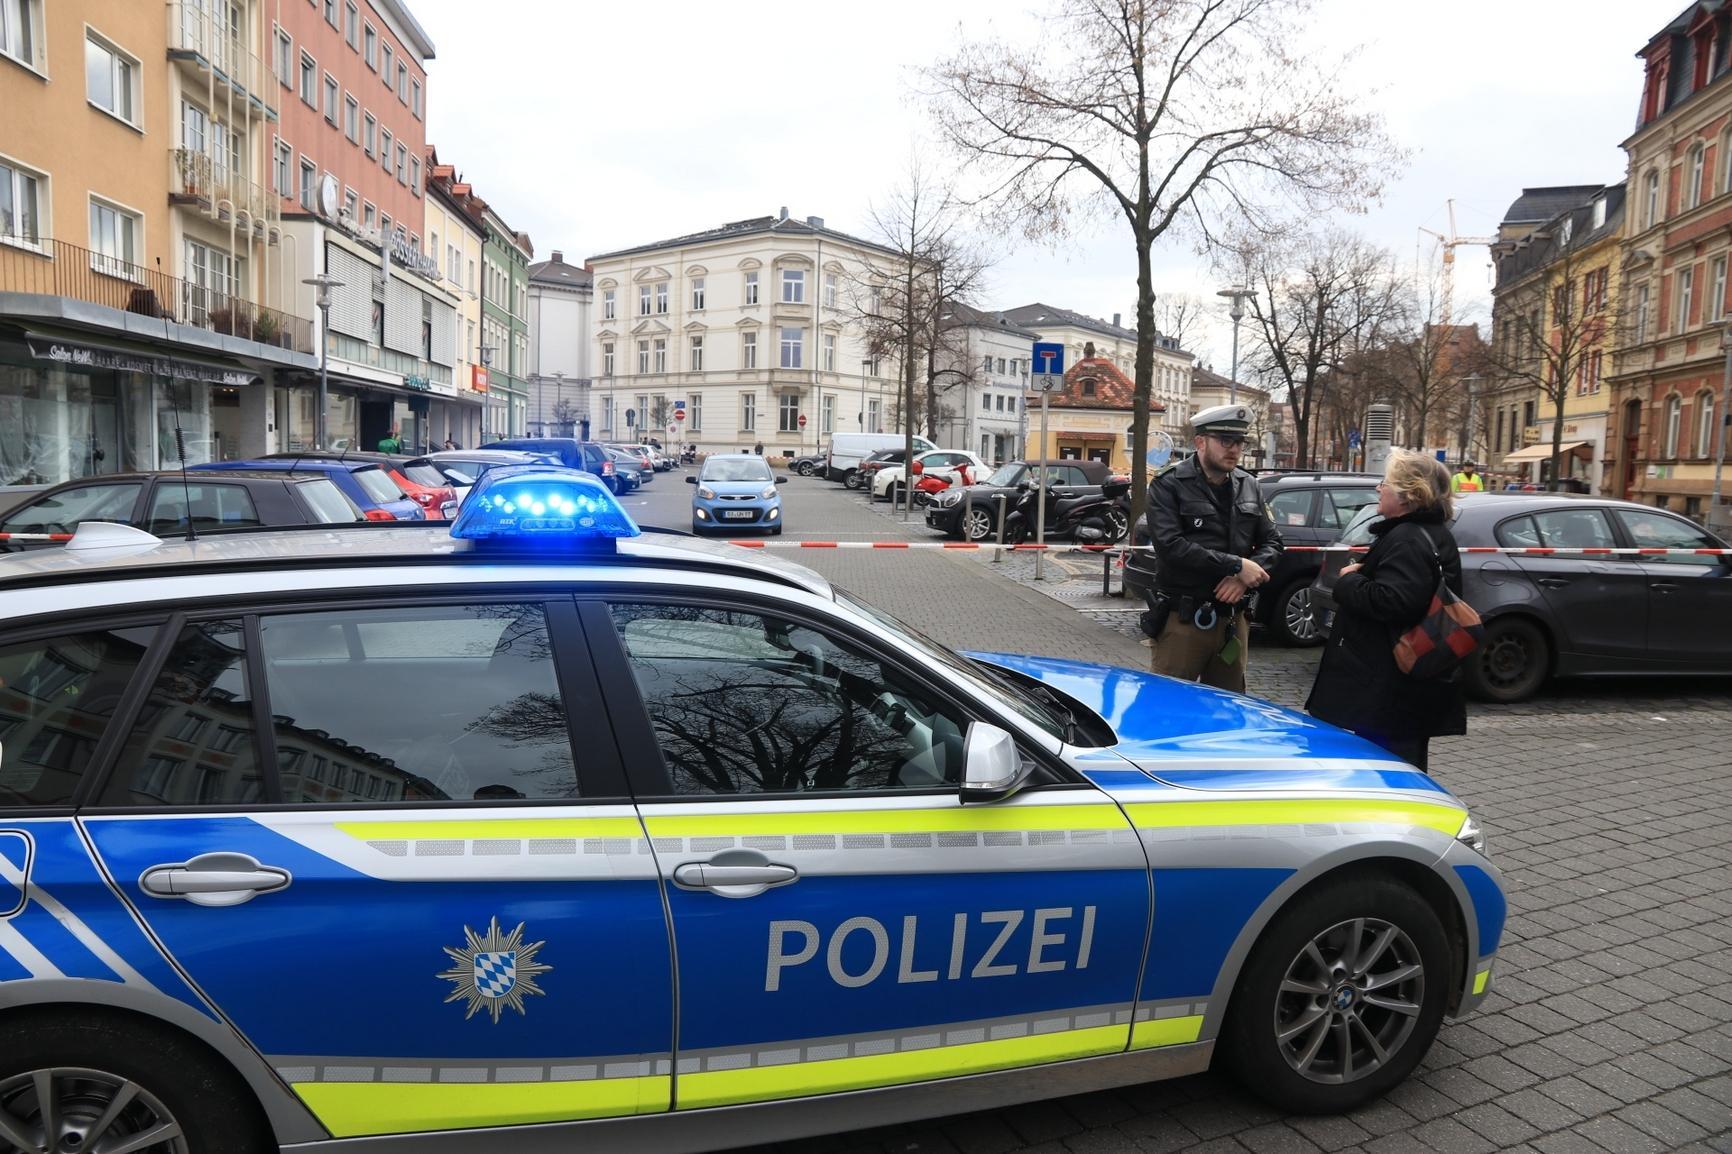 Bombendrohung: Polizei räumt Busbahnhof in Bamberg